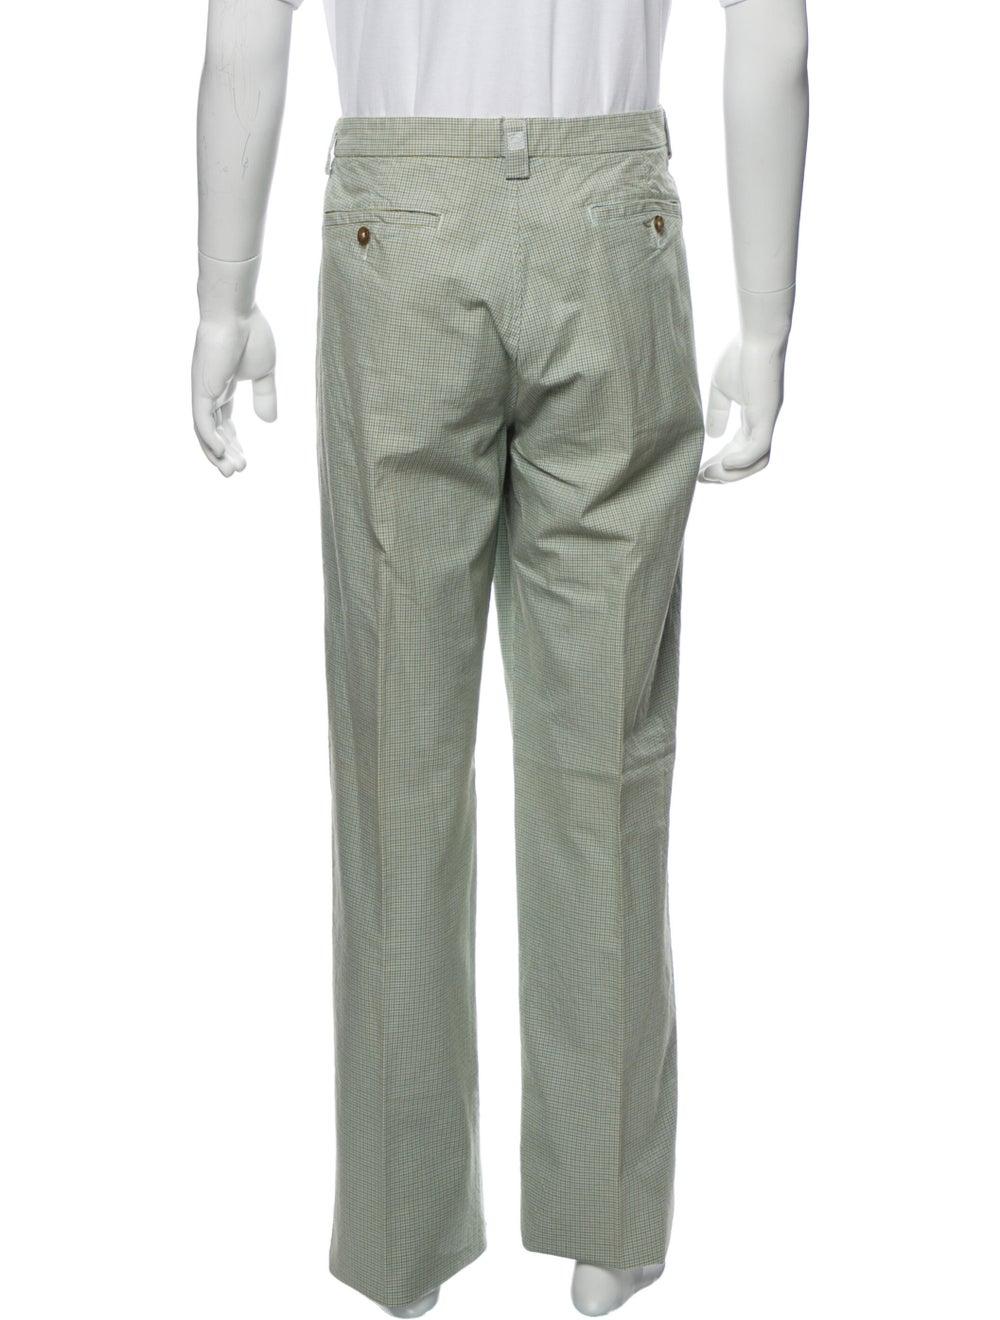 Etro Plaid Print Pants Green - image 3